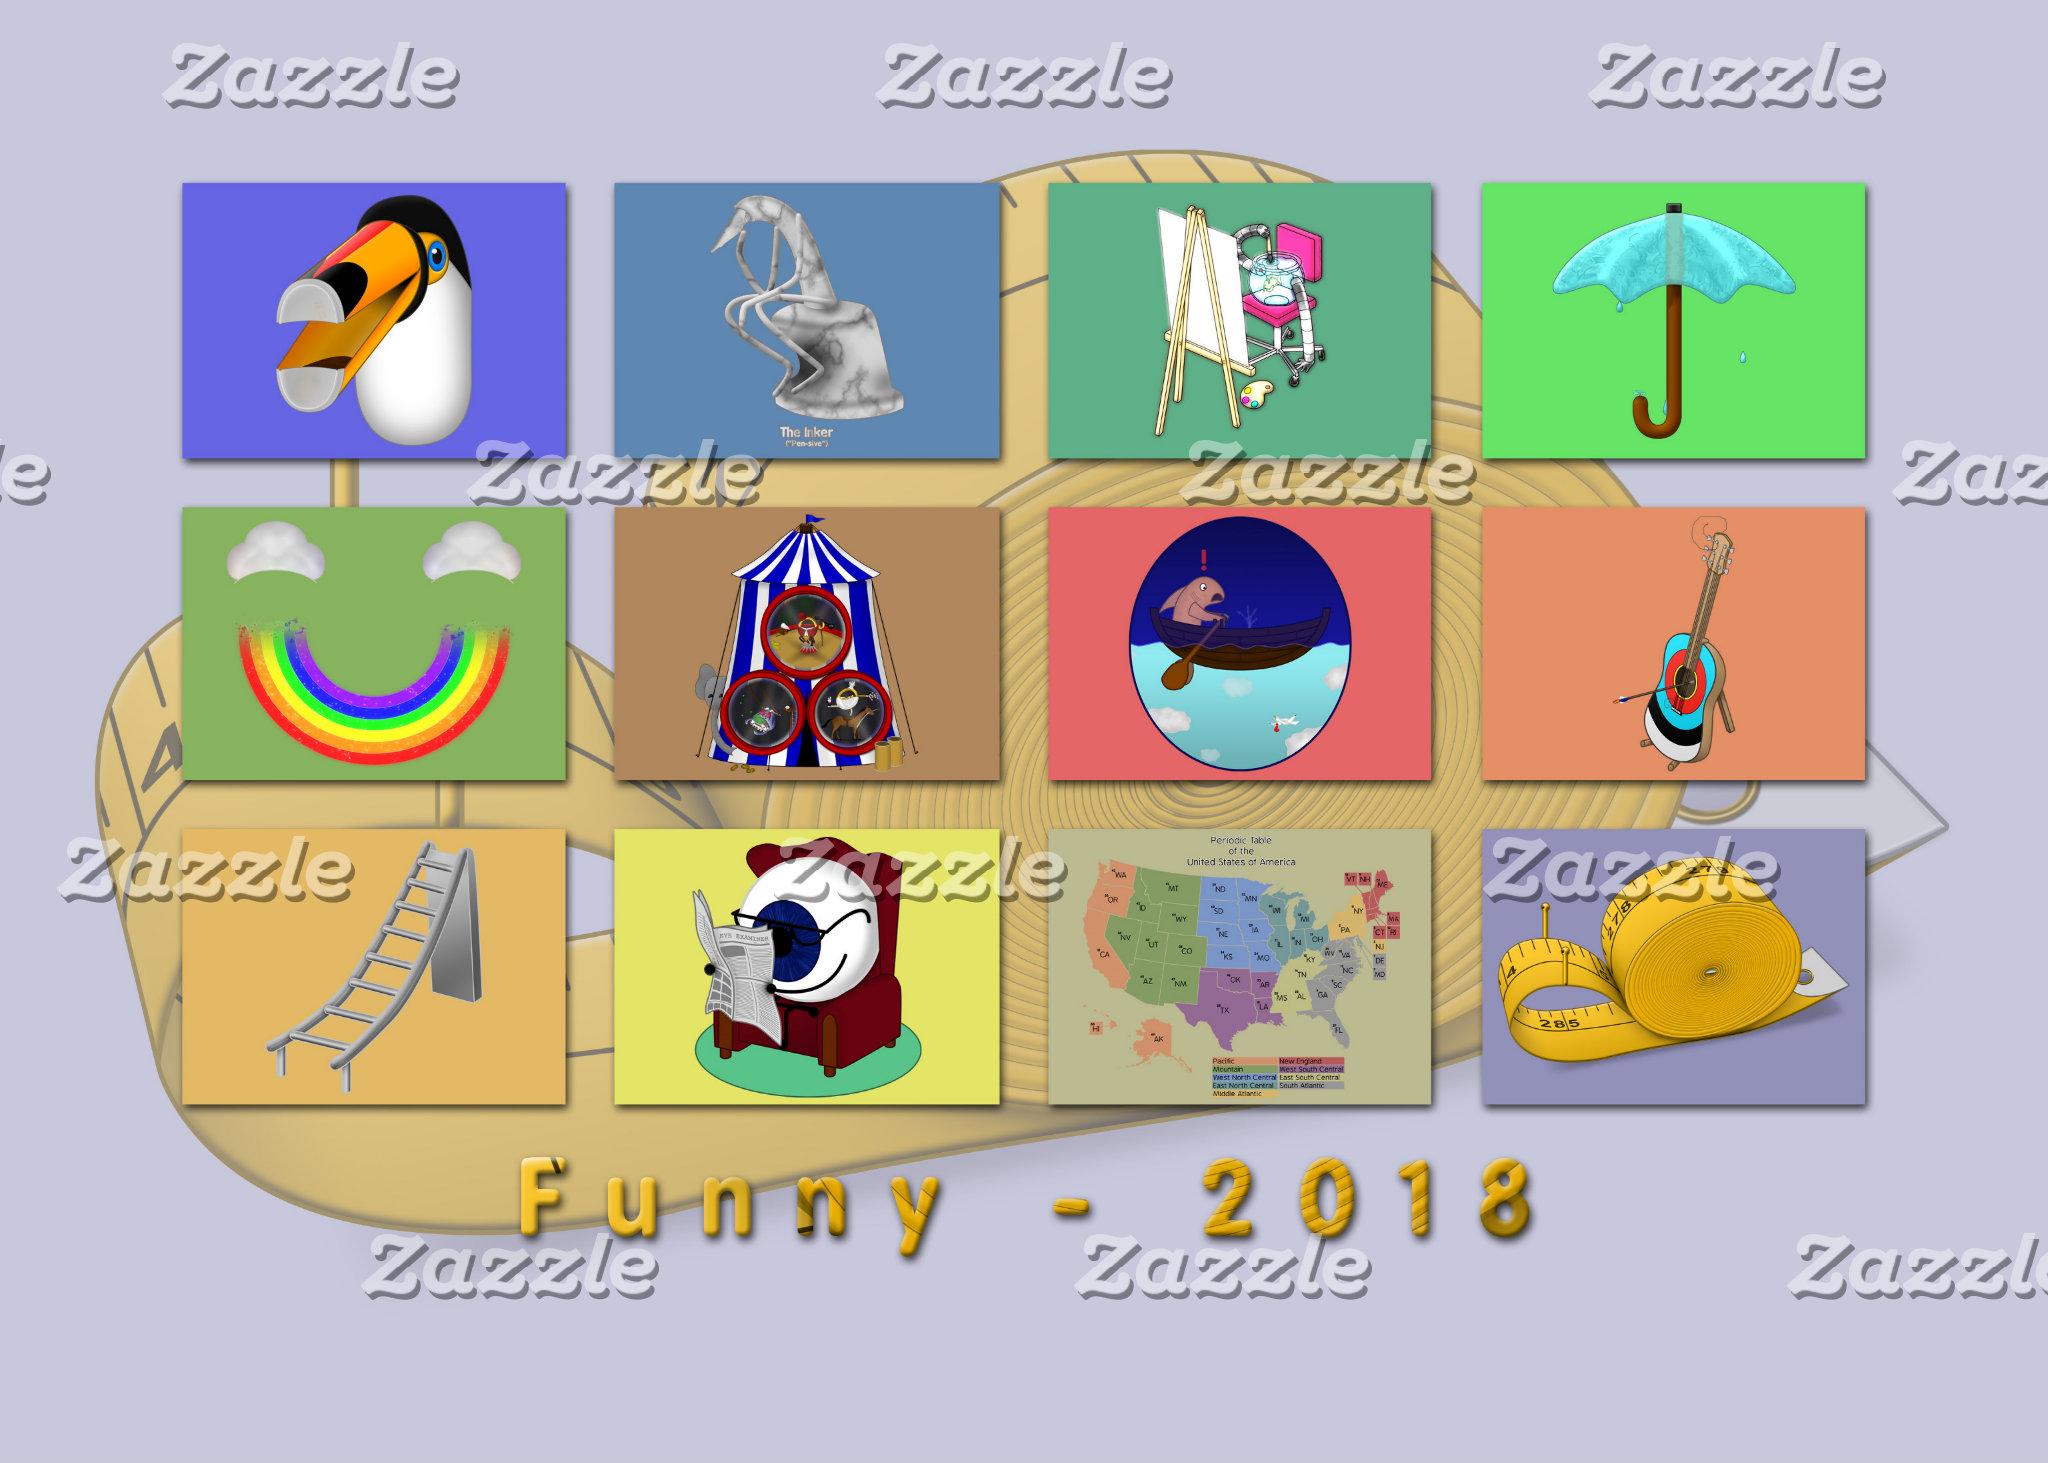 2018 Calendars